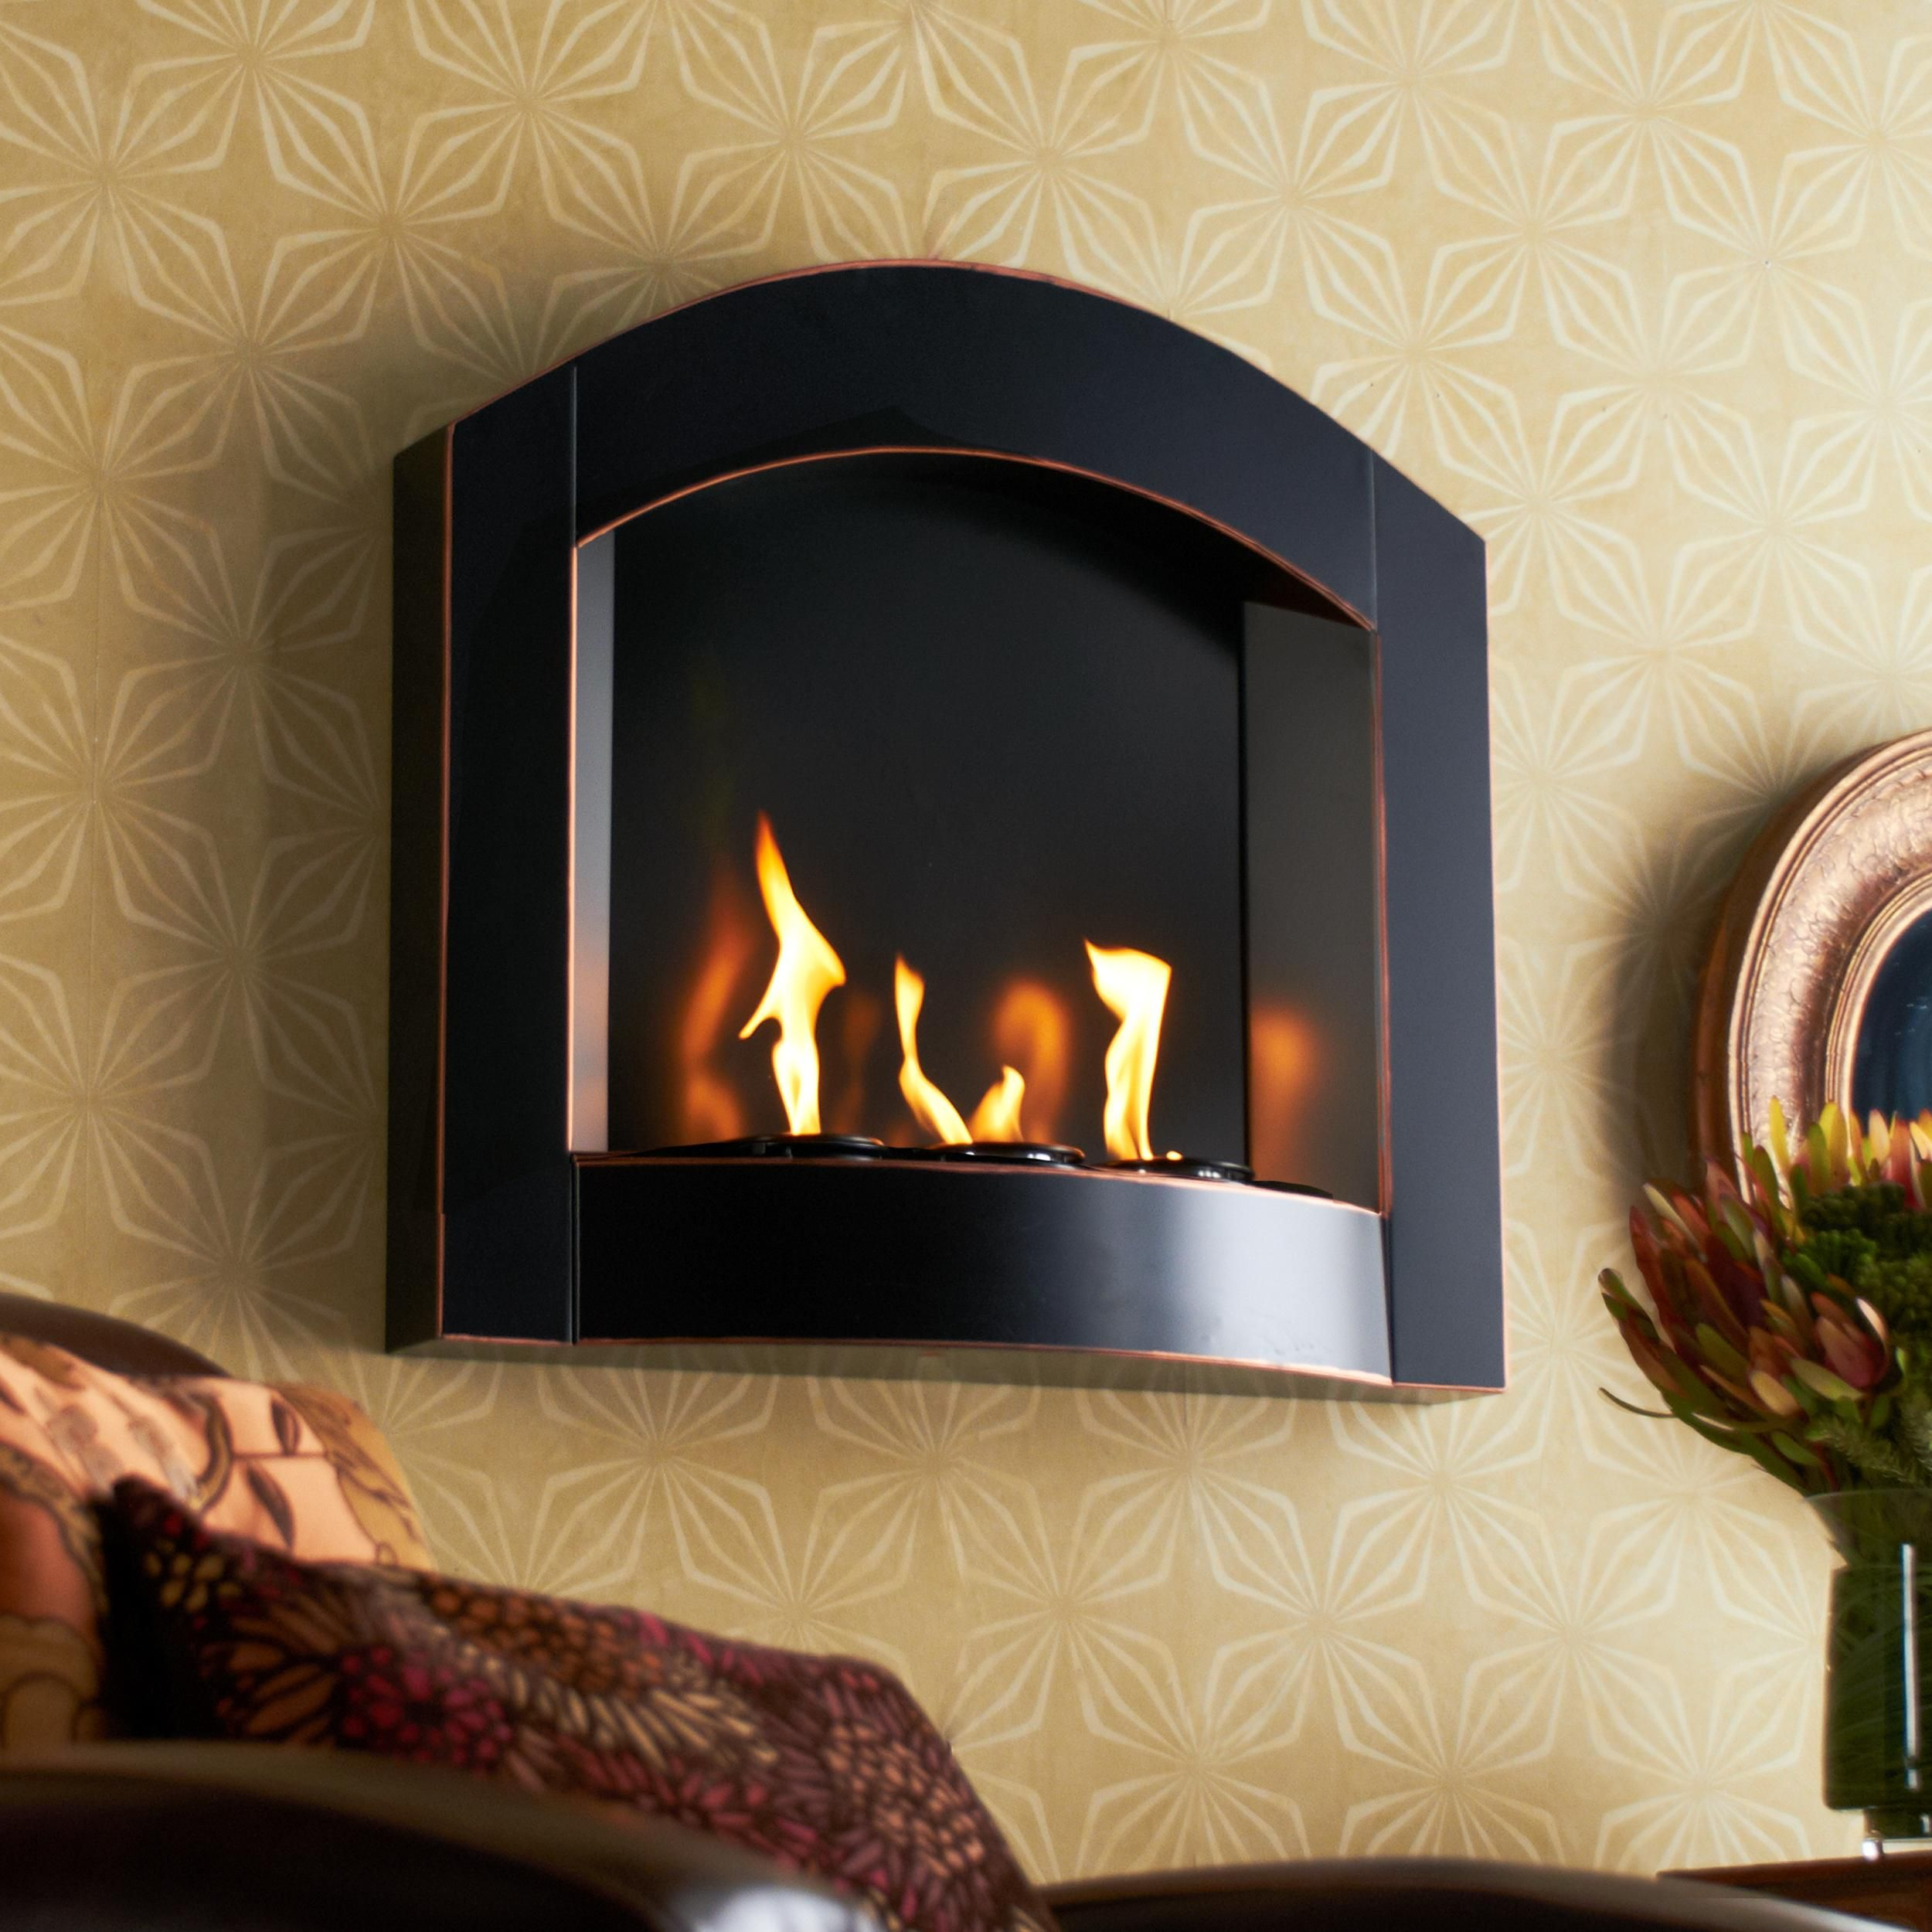 Amazon Com Sei Black Arch Top Wall Mount Gel Fuel Fireplace